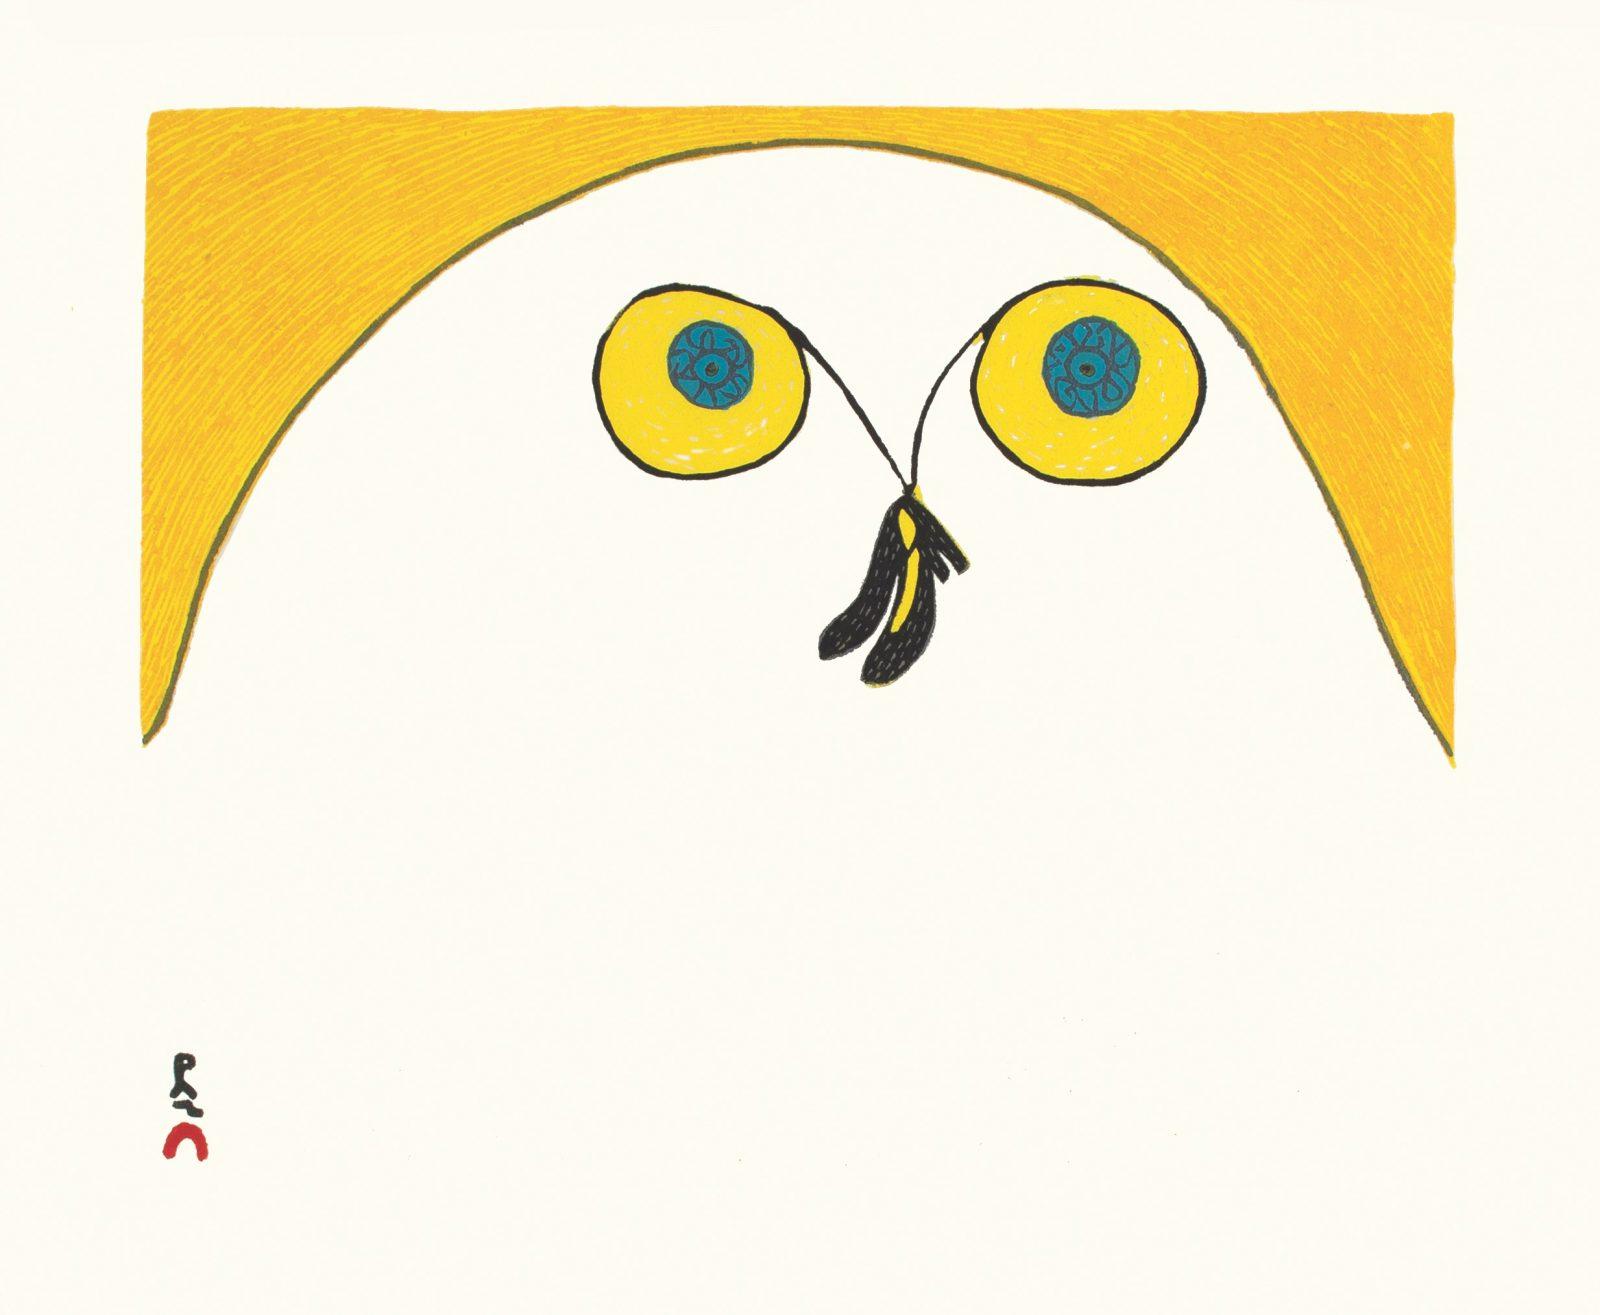 NINGIUKULU TEEVEE Strutting Owl Cape Dorset Print 2021